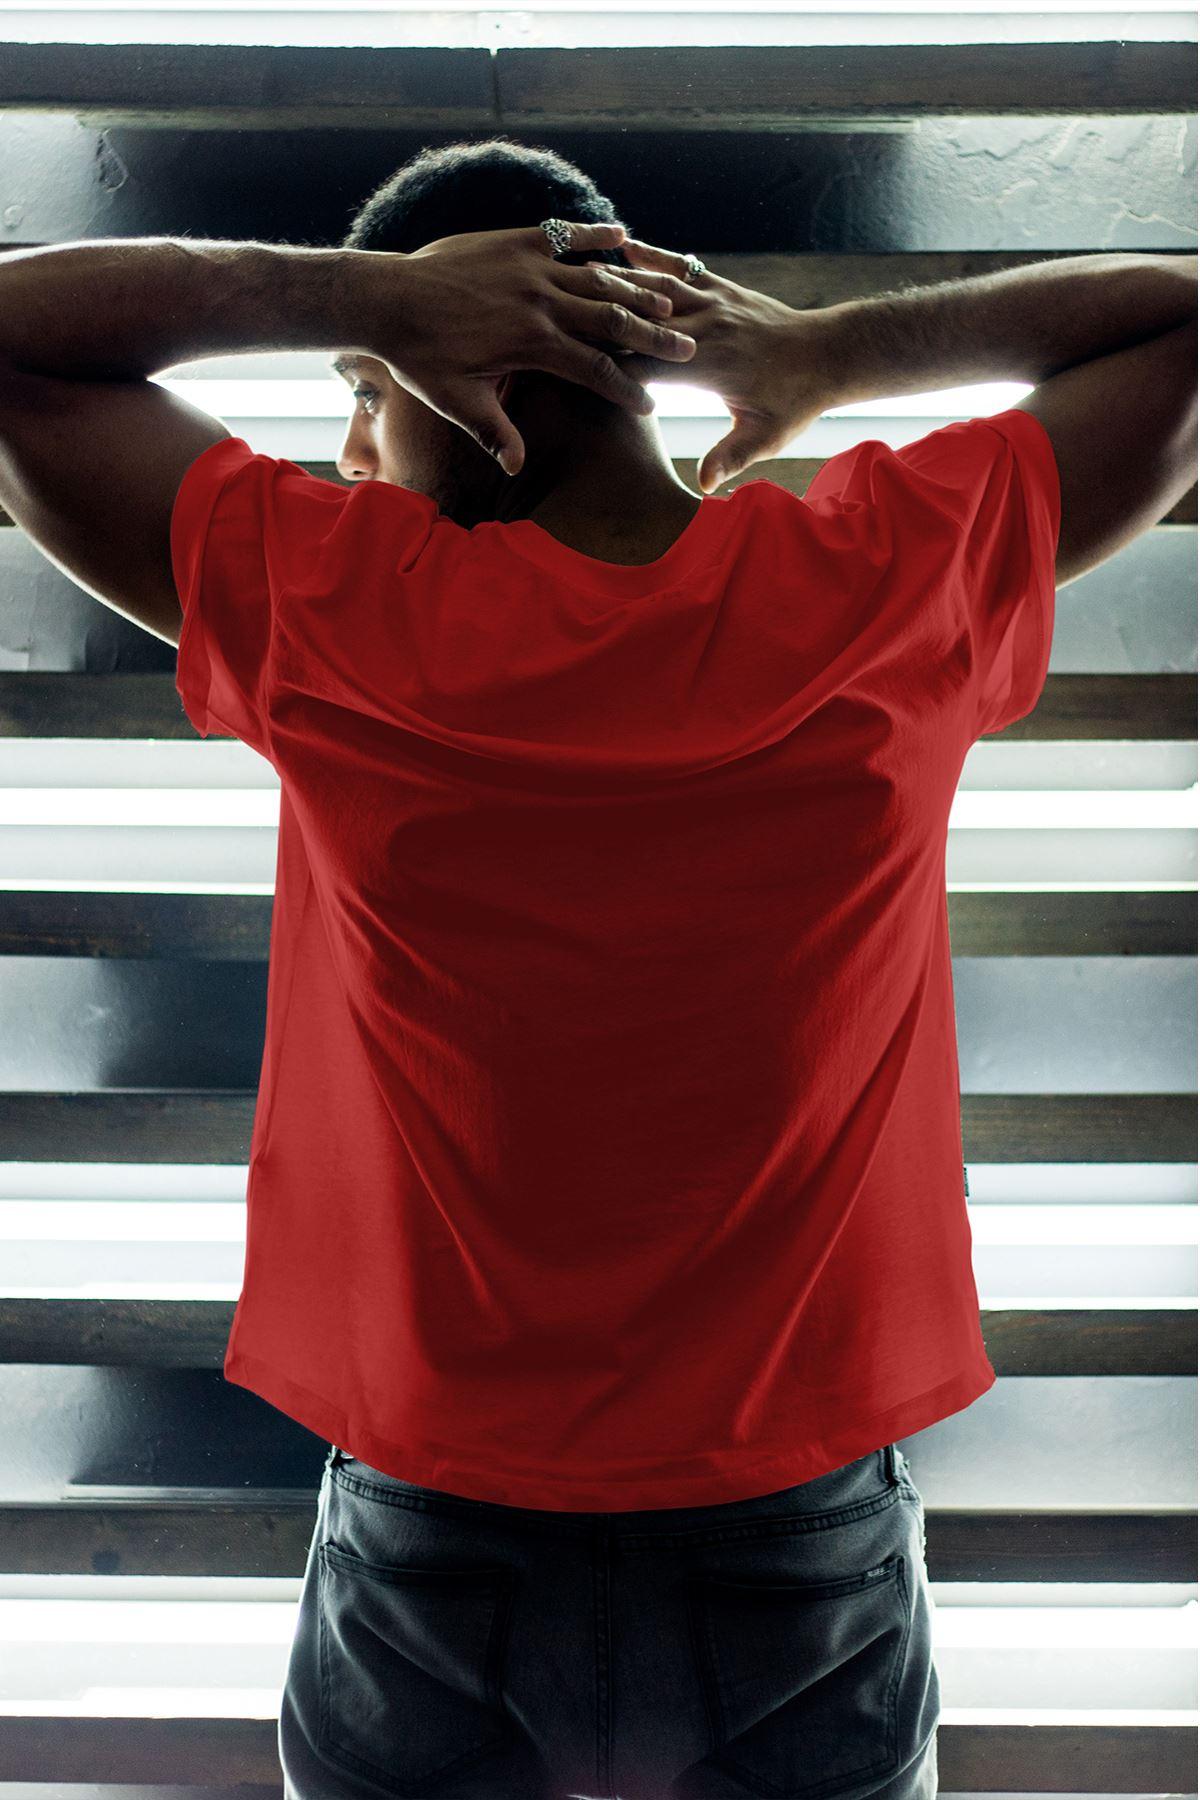 Chicago Bulls 37 Kırmızı Erkek Oversize Tshirt - Tişört